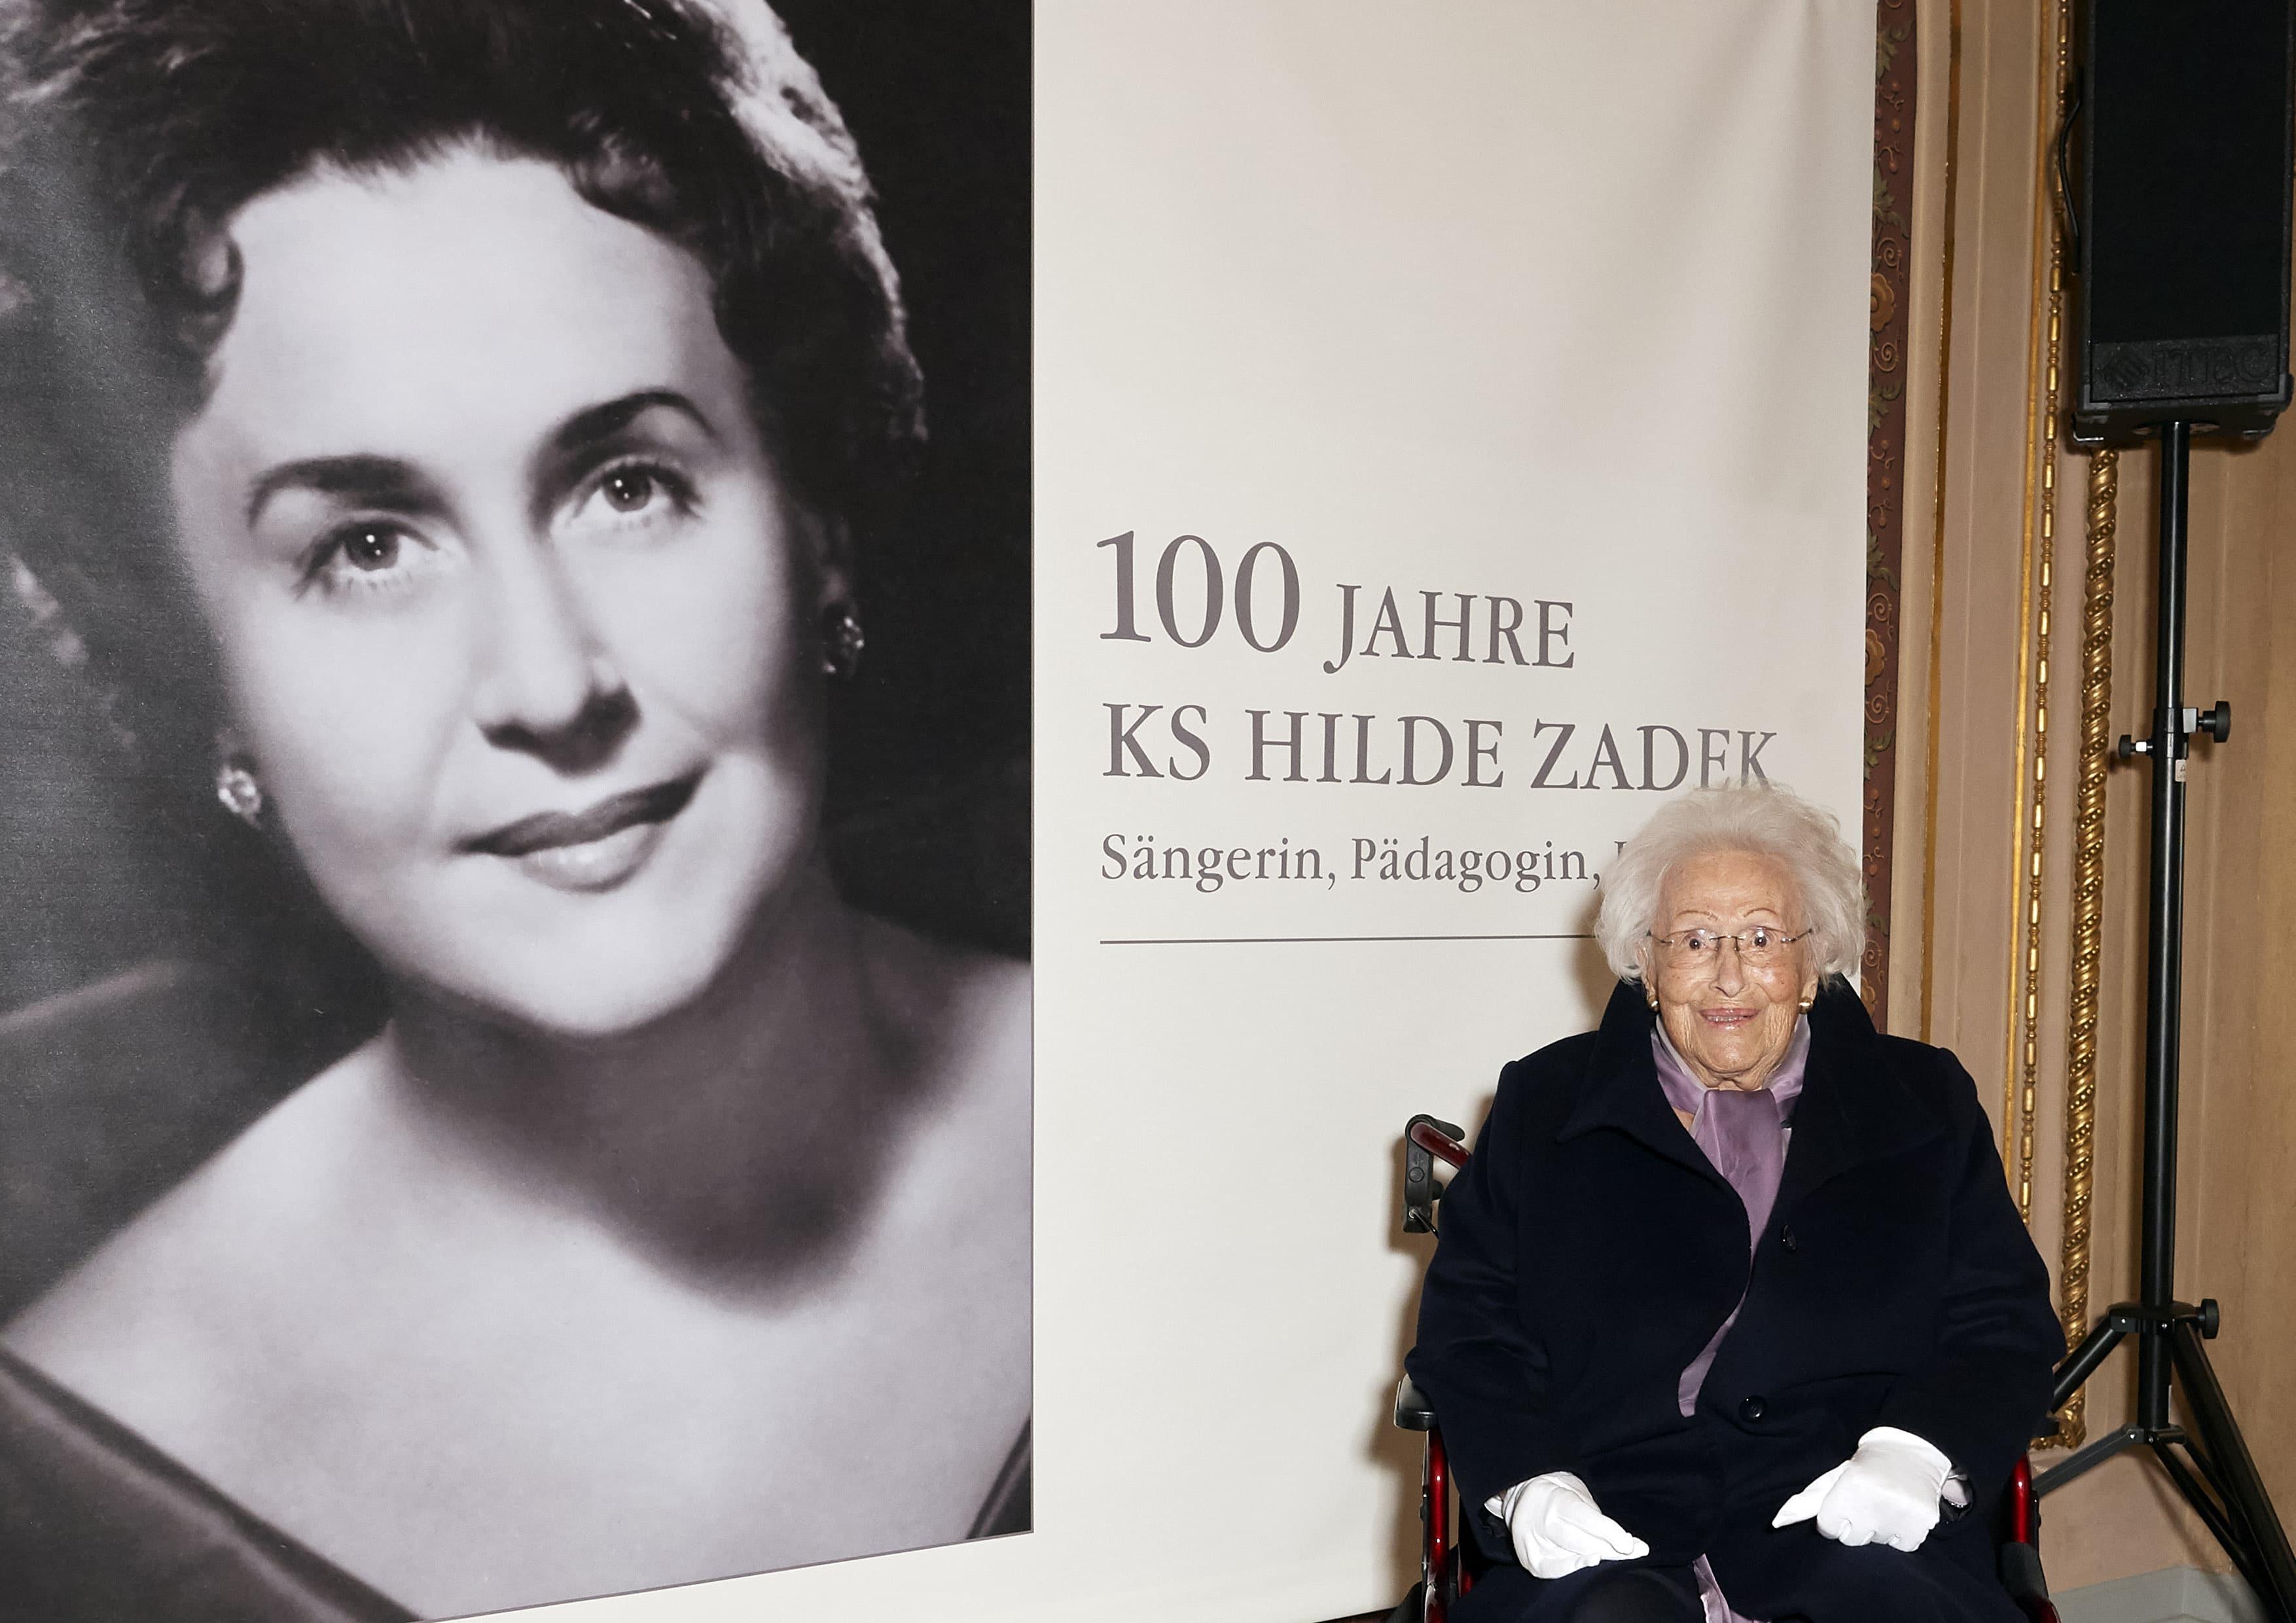 Vienna Opera extols a 100 year-old soprano